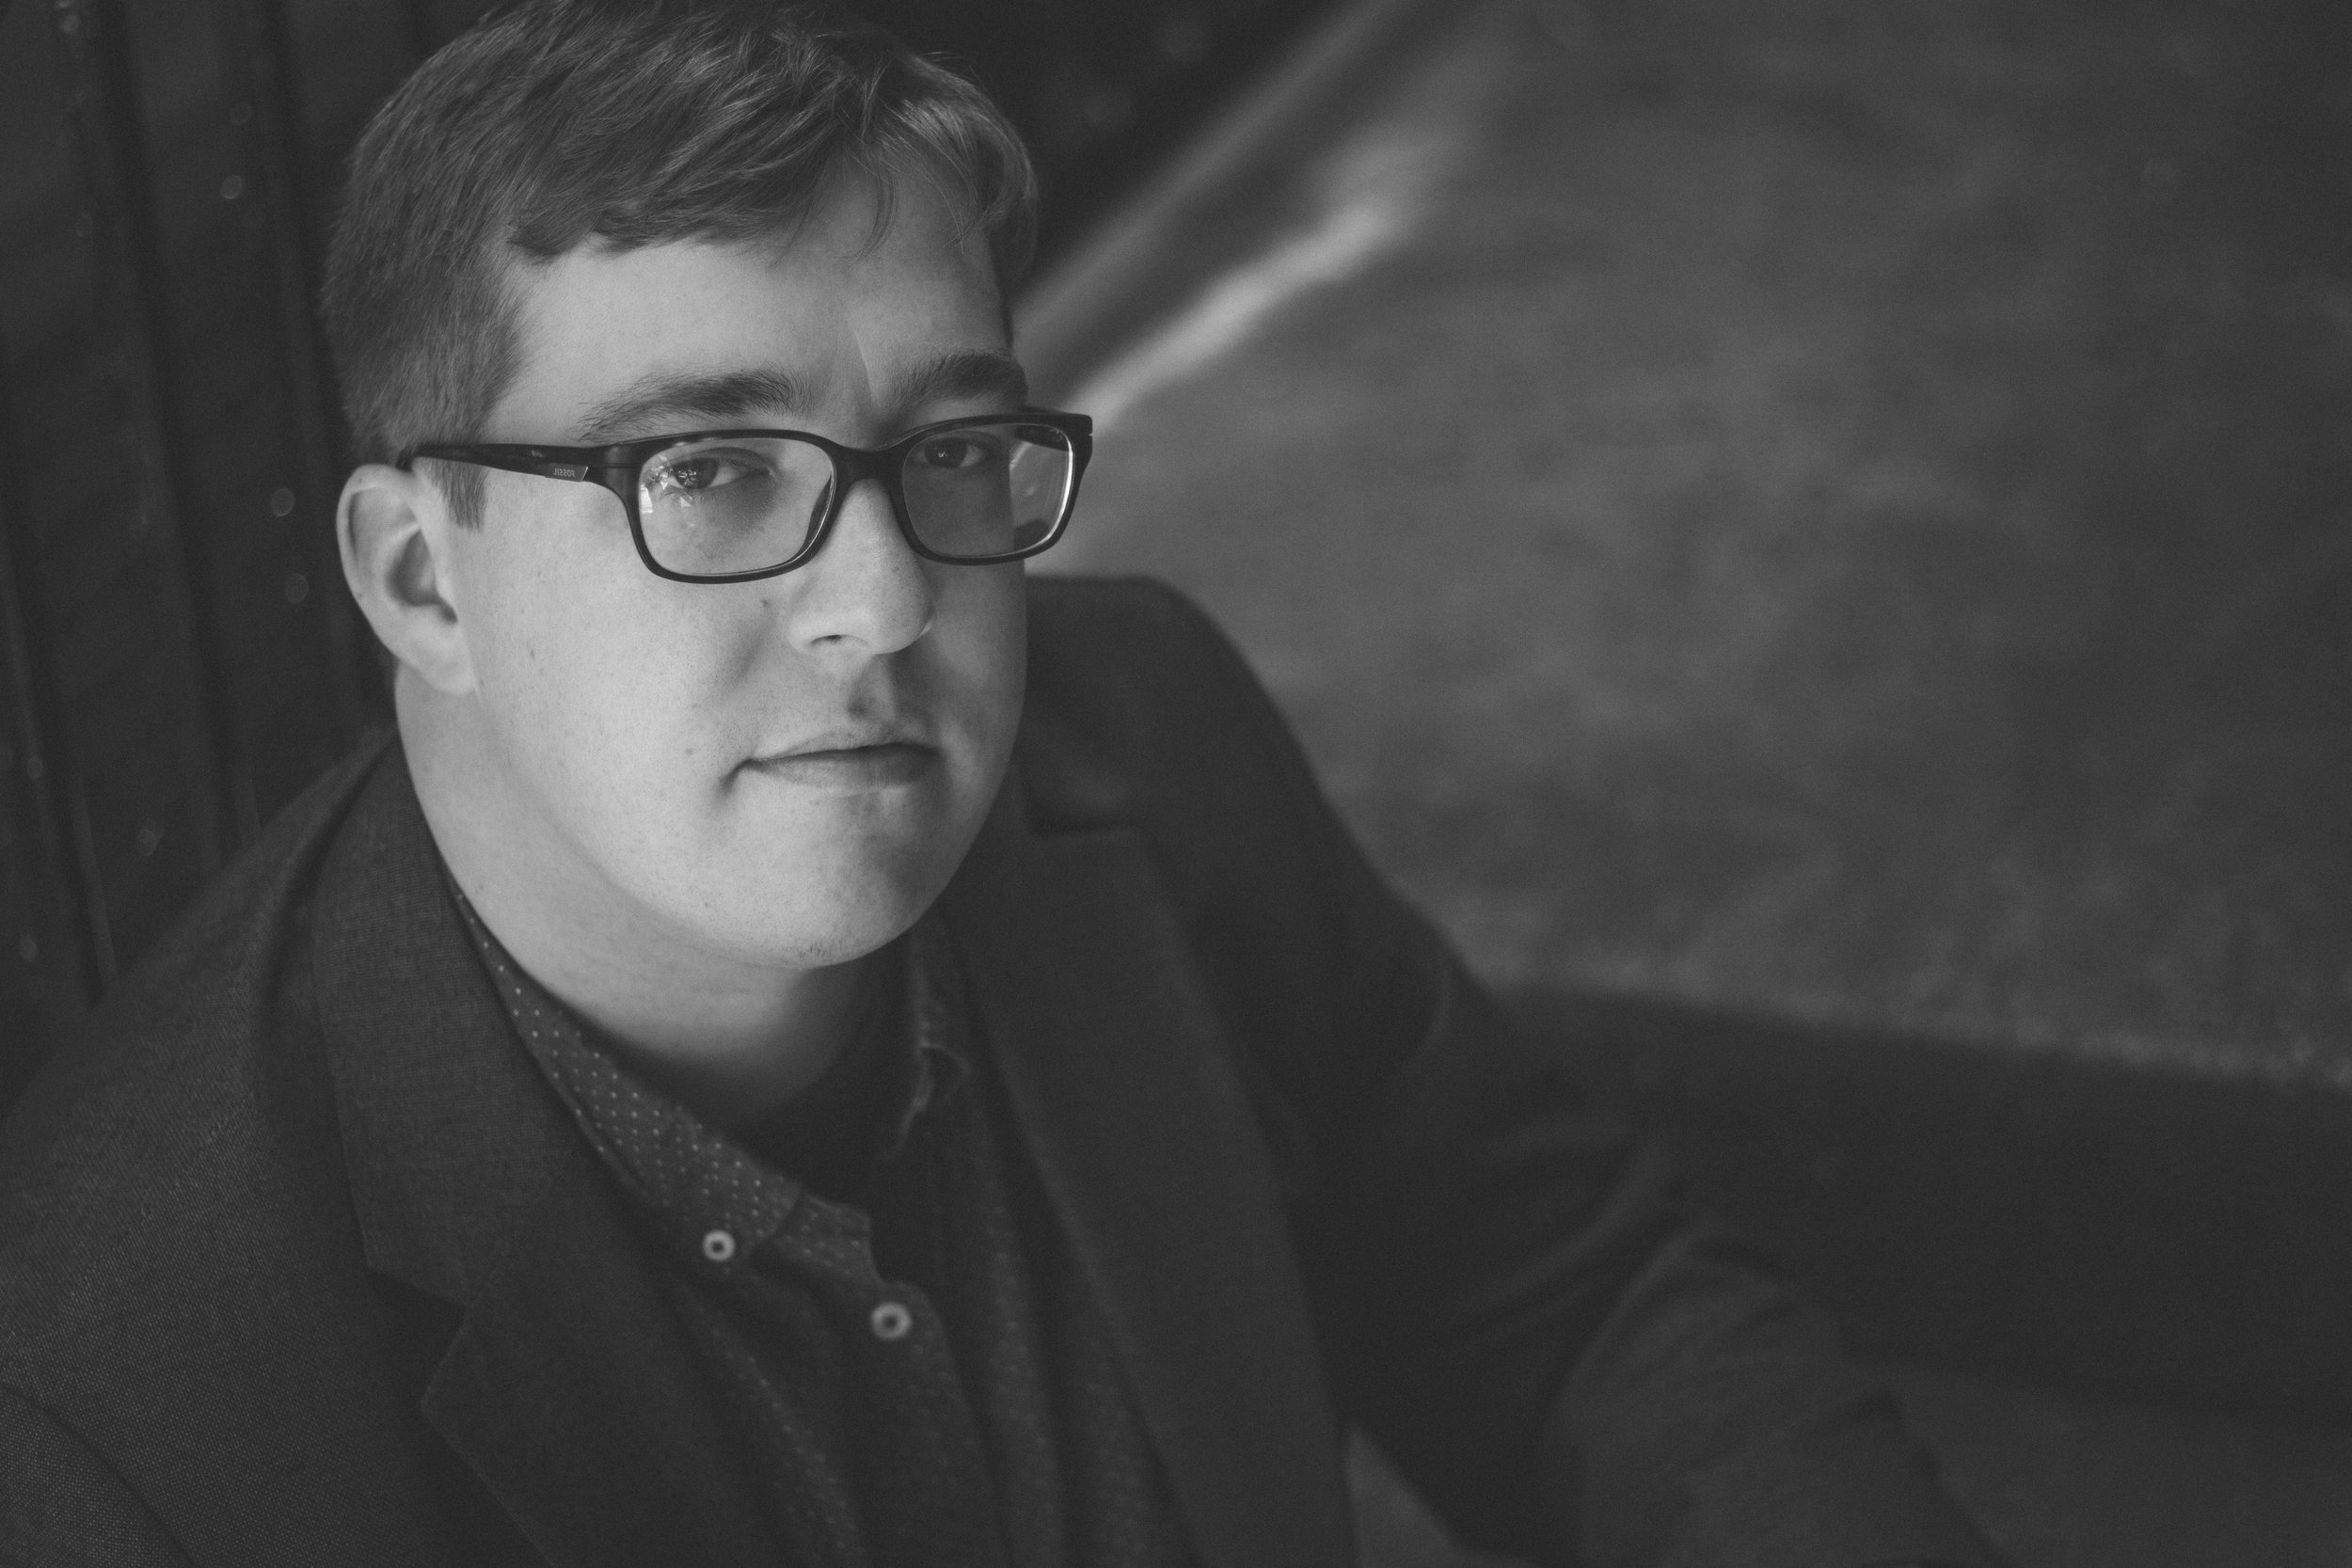 FRONT TECHNICIAN - Josh Spaulding